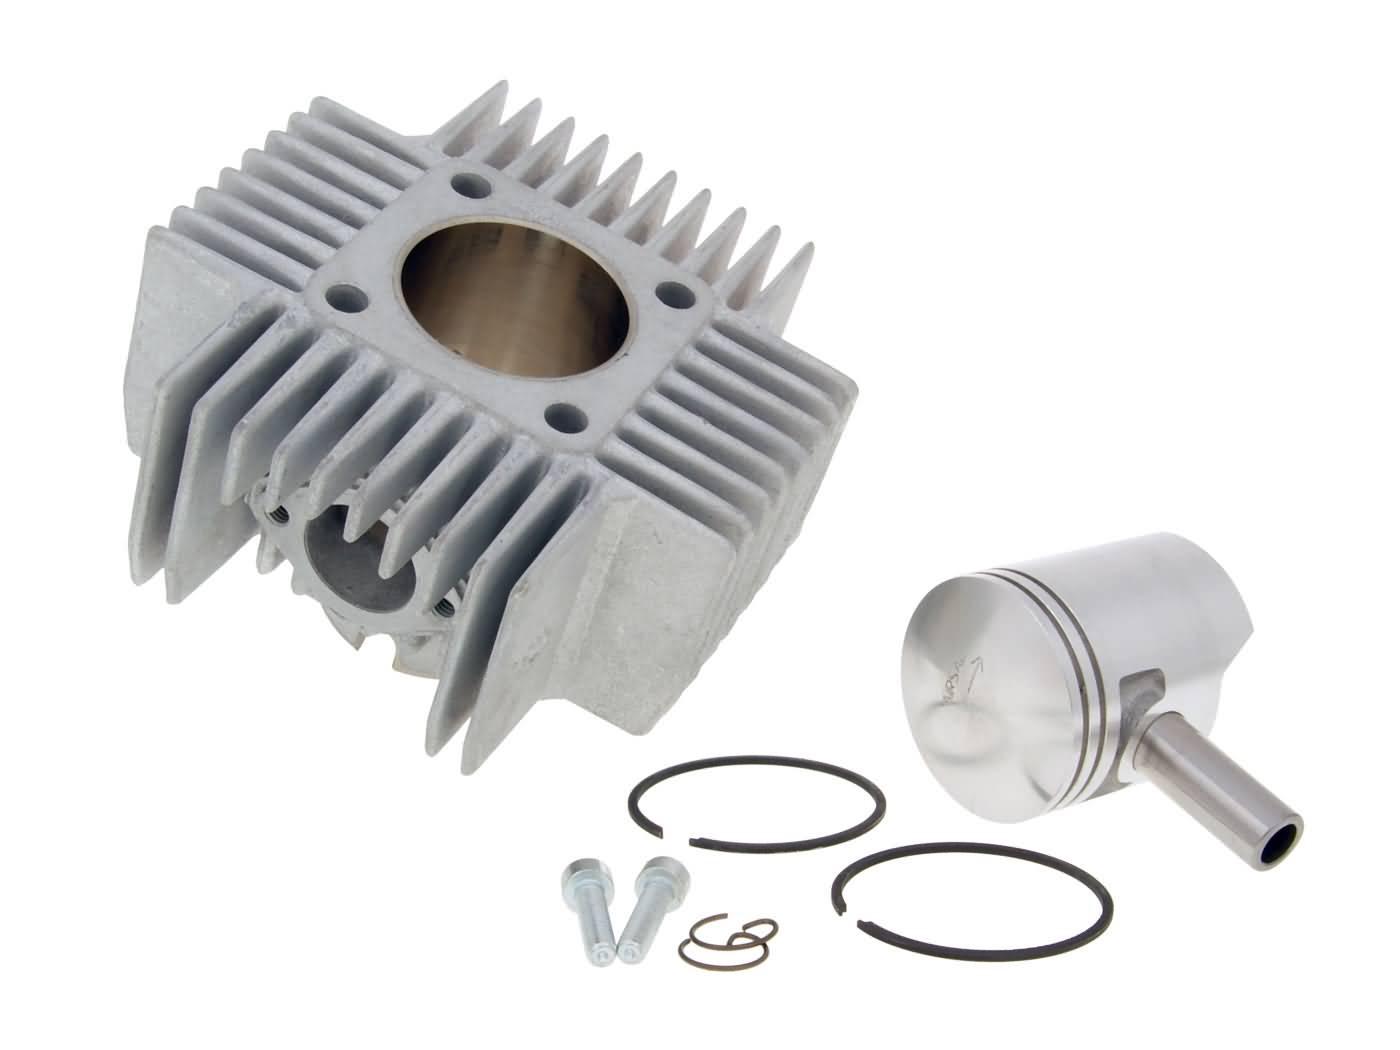 Quadra 50 AC AIRSAL 50ccm Sport Zylinder Kit f/ür Beta Ark 50 AC Chrono 50